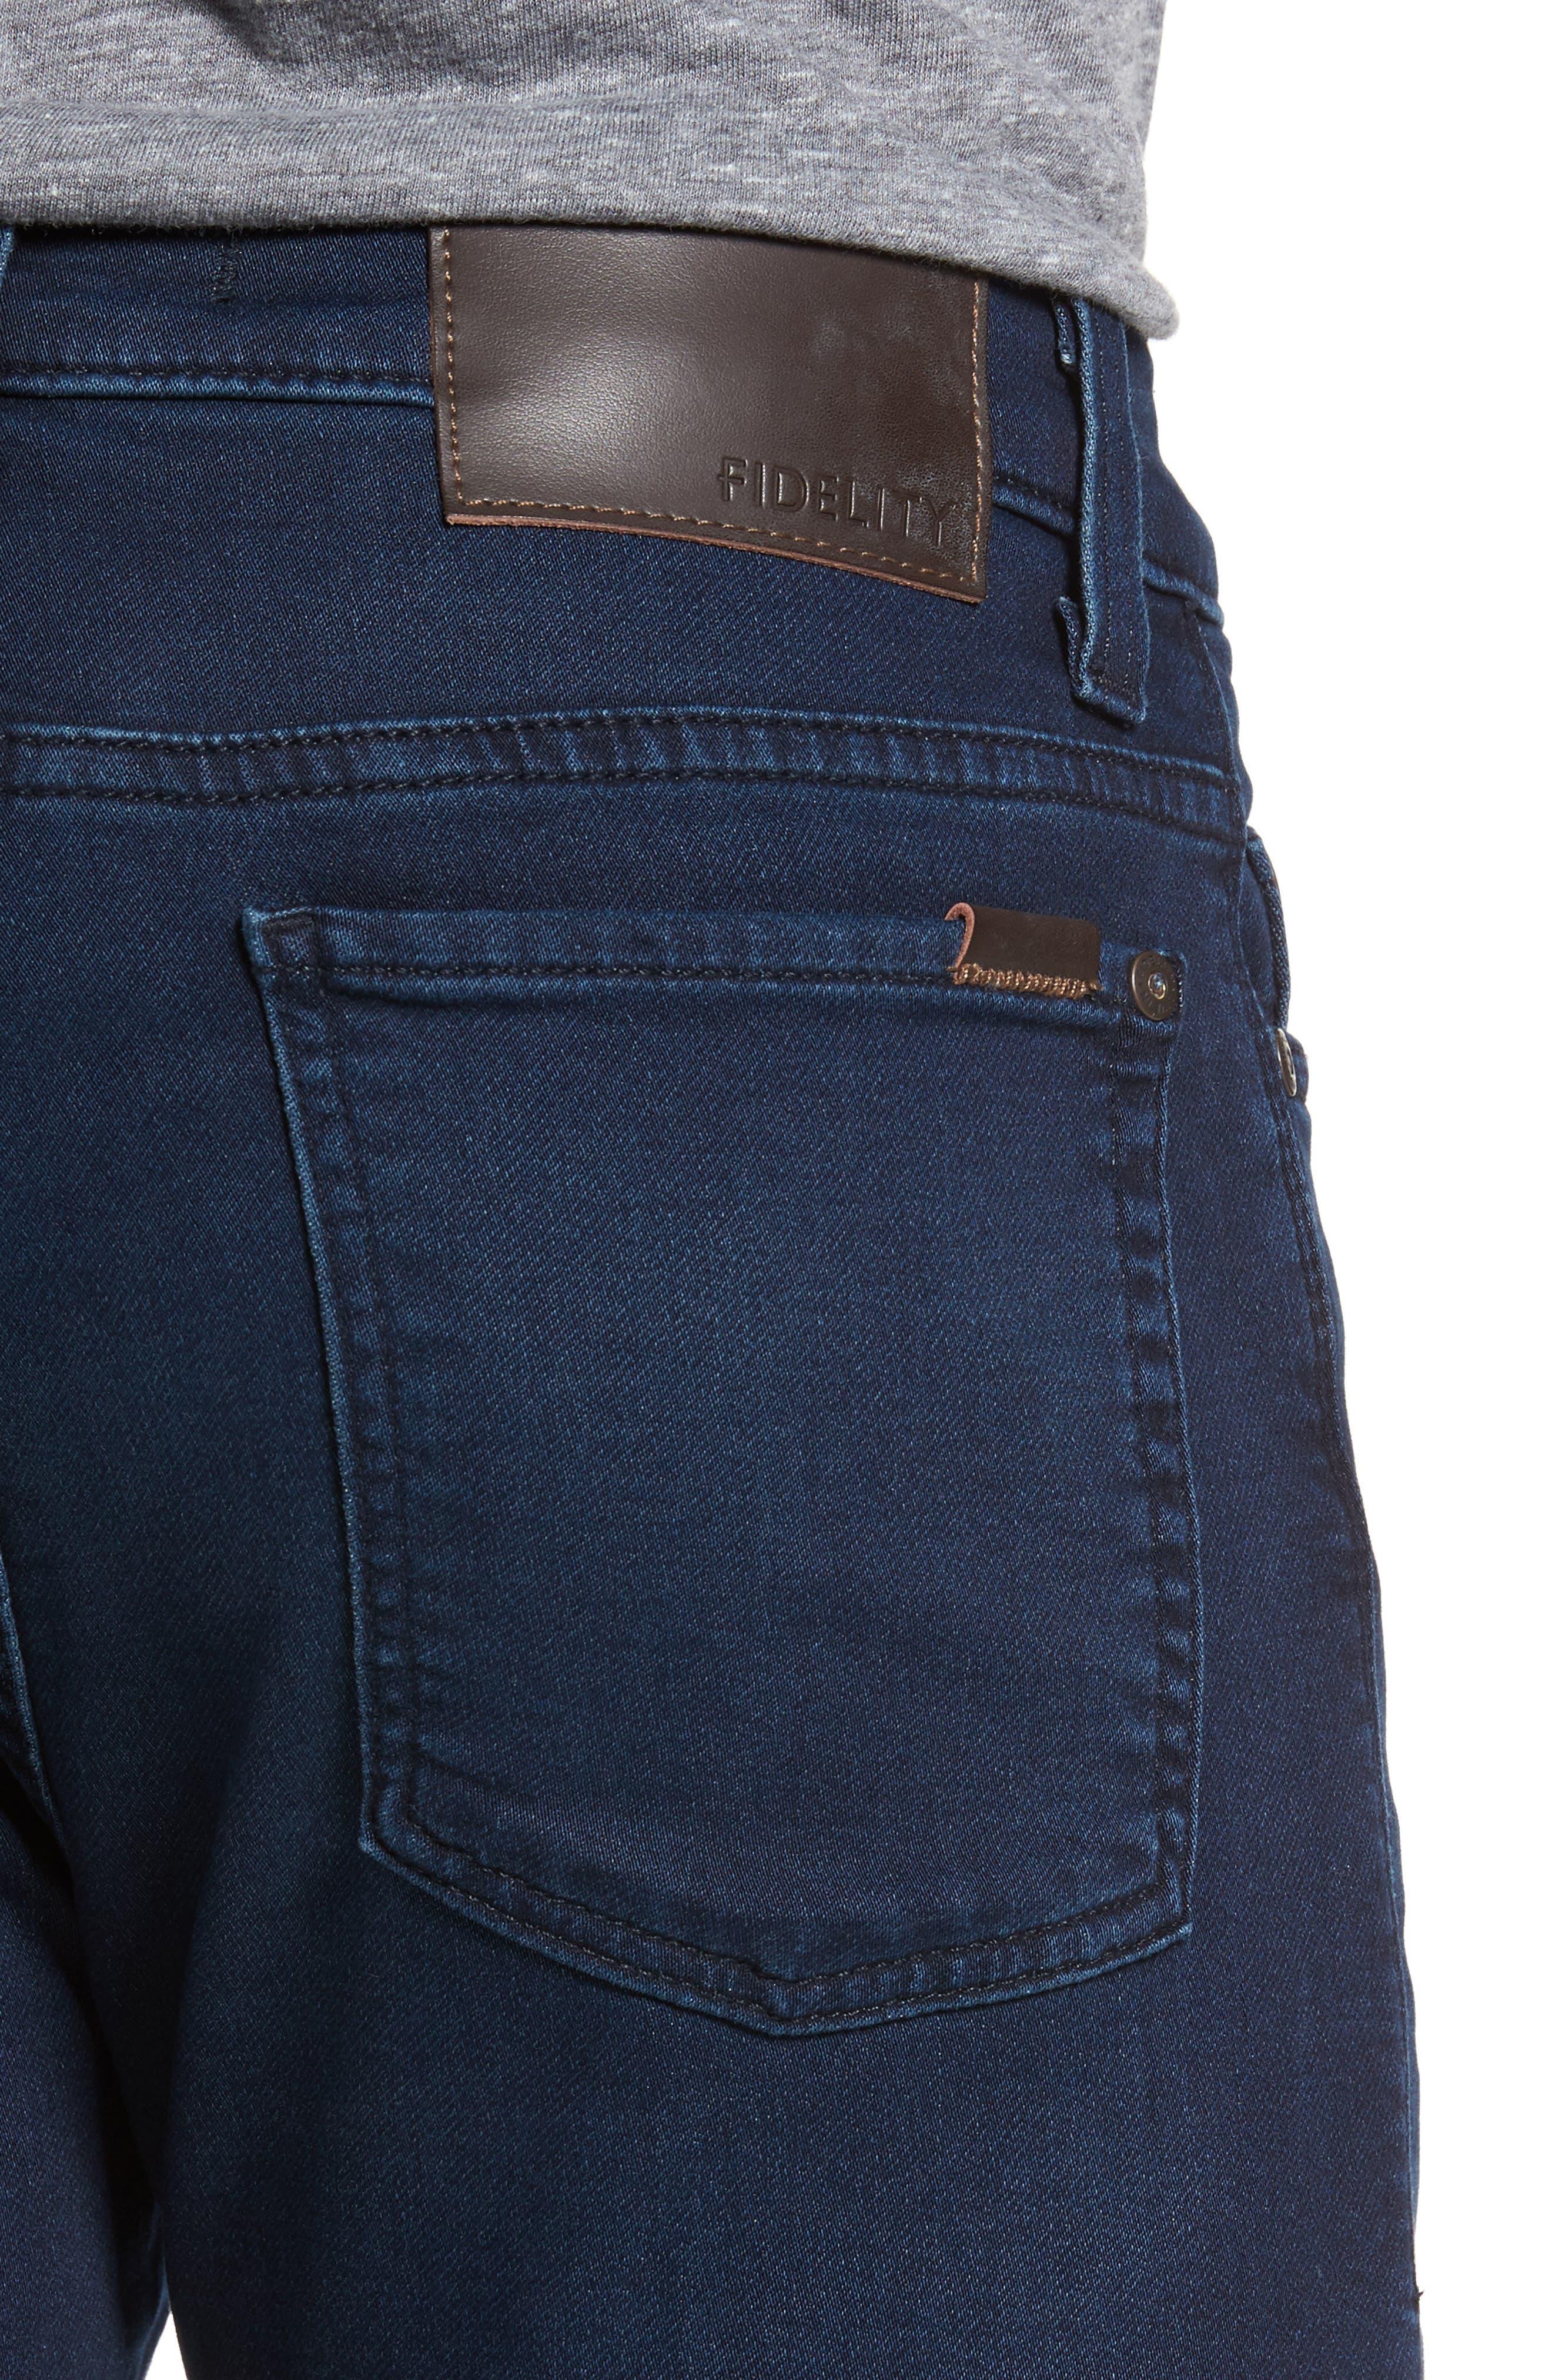 Torino Slim Fit Jeans,                             Alternate thumbnail 4, color,                             Lemmy Blue